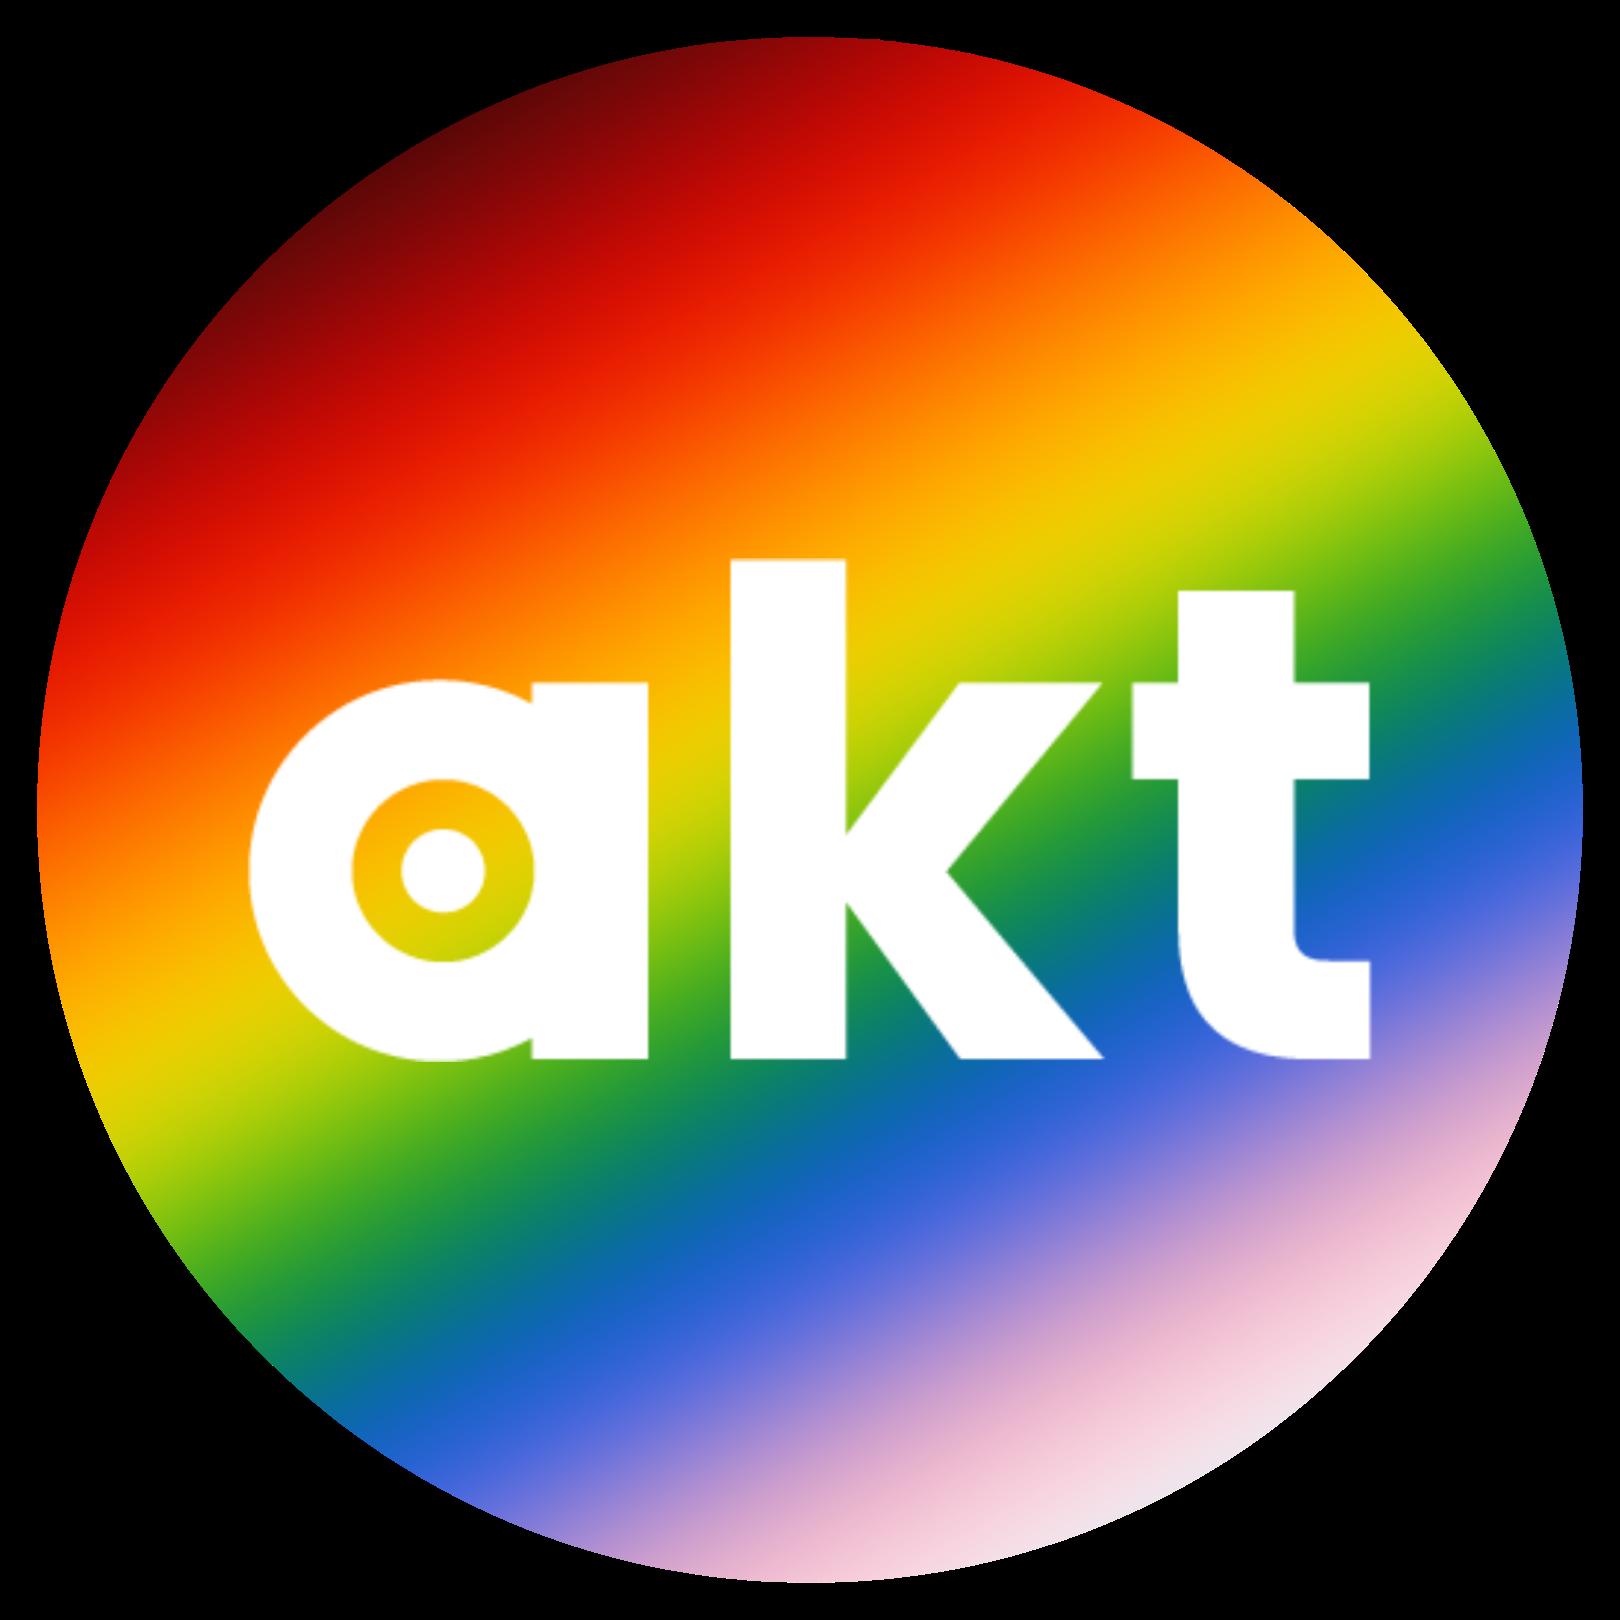 pride-akt-logo.png